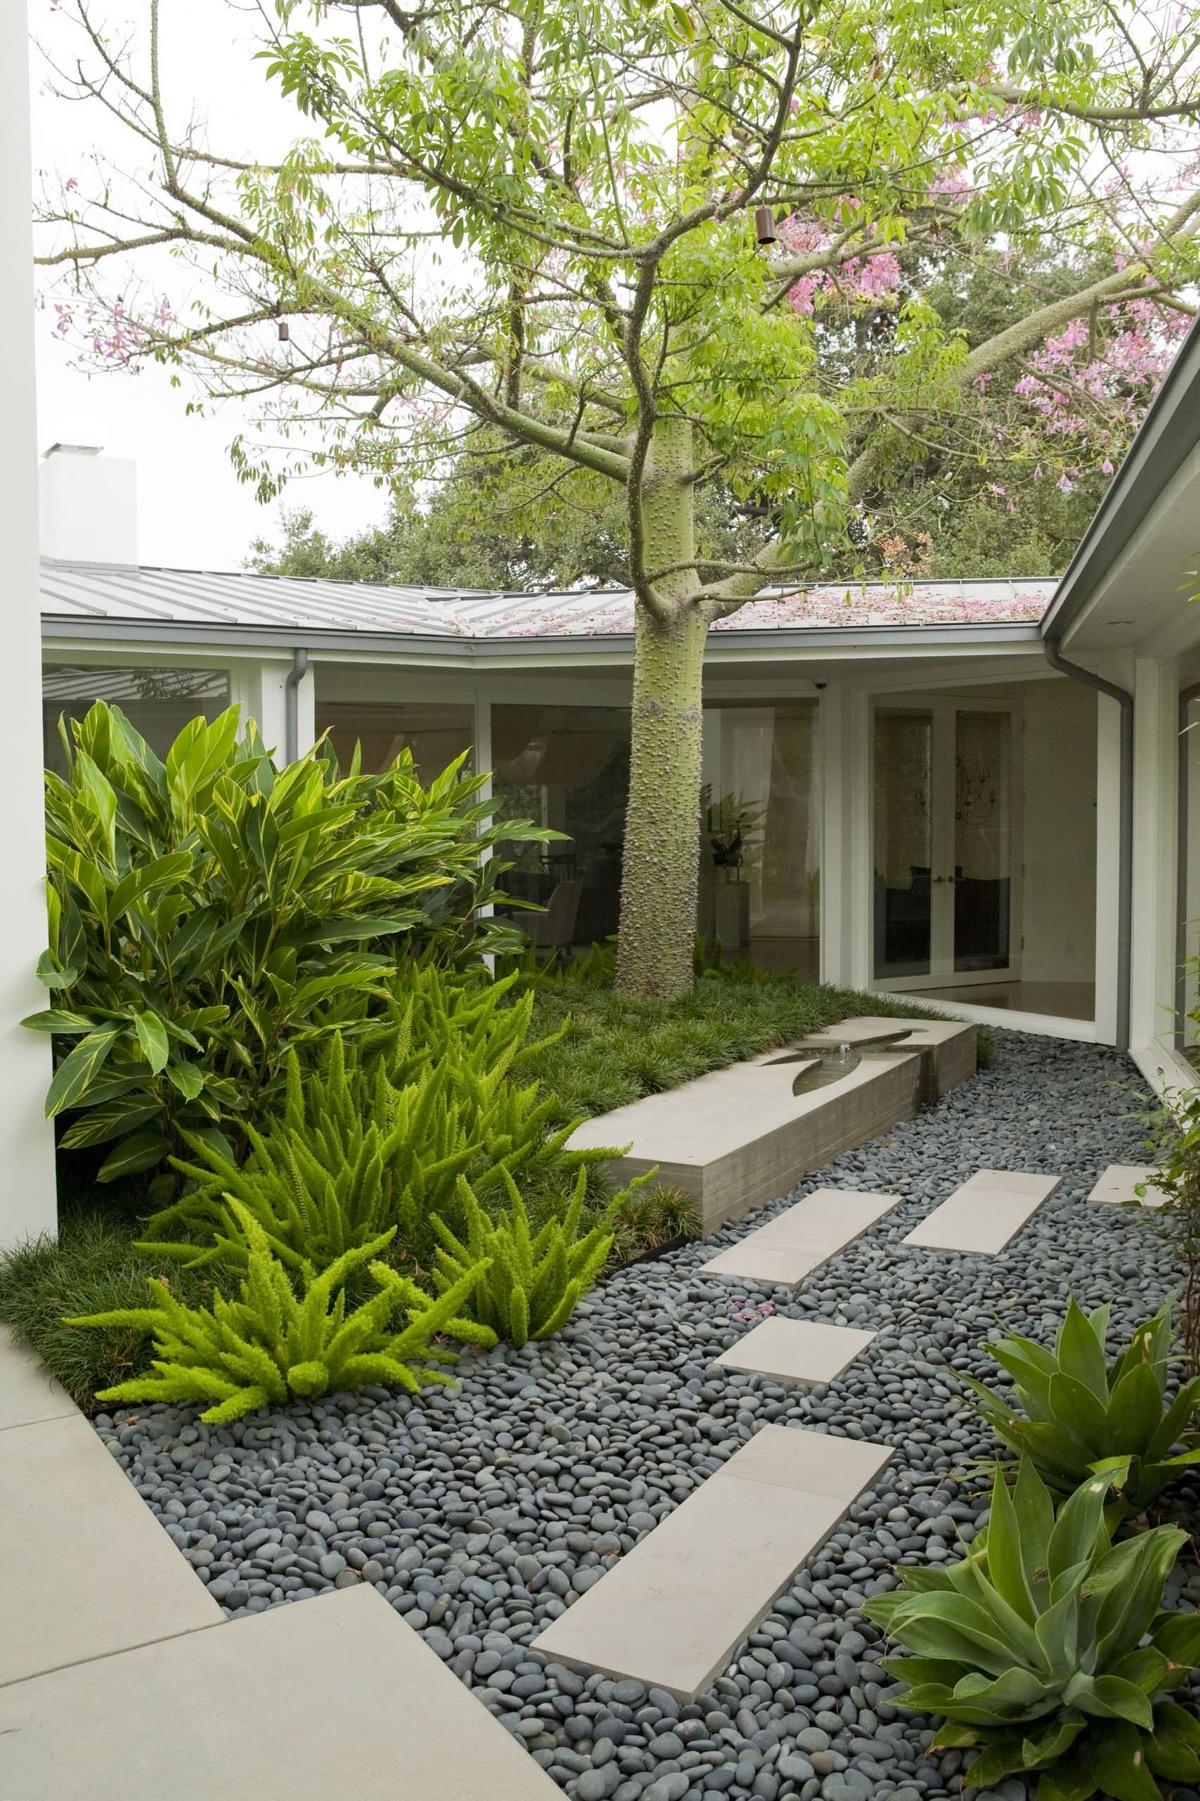 51 Captivating Courtyard Designs That Make Us Go Wow on Backyard Courtyard Design Ideas id=72986